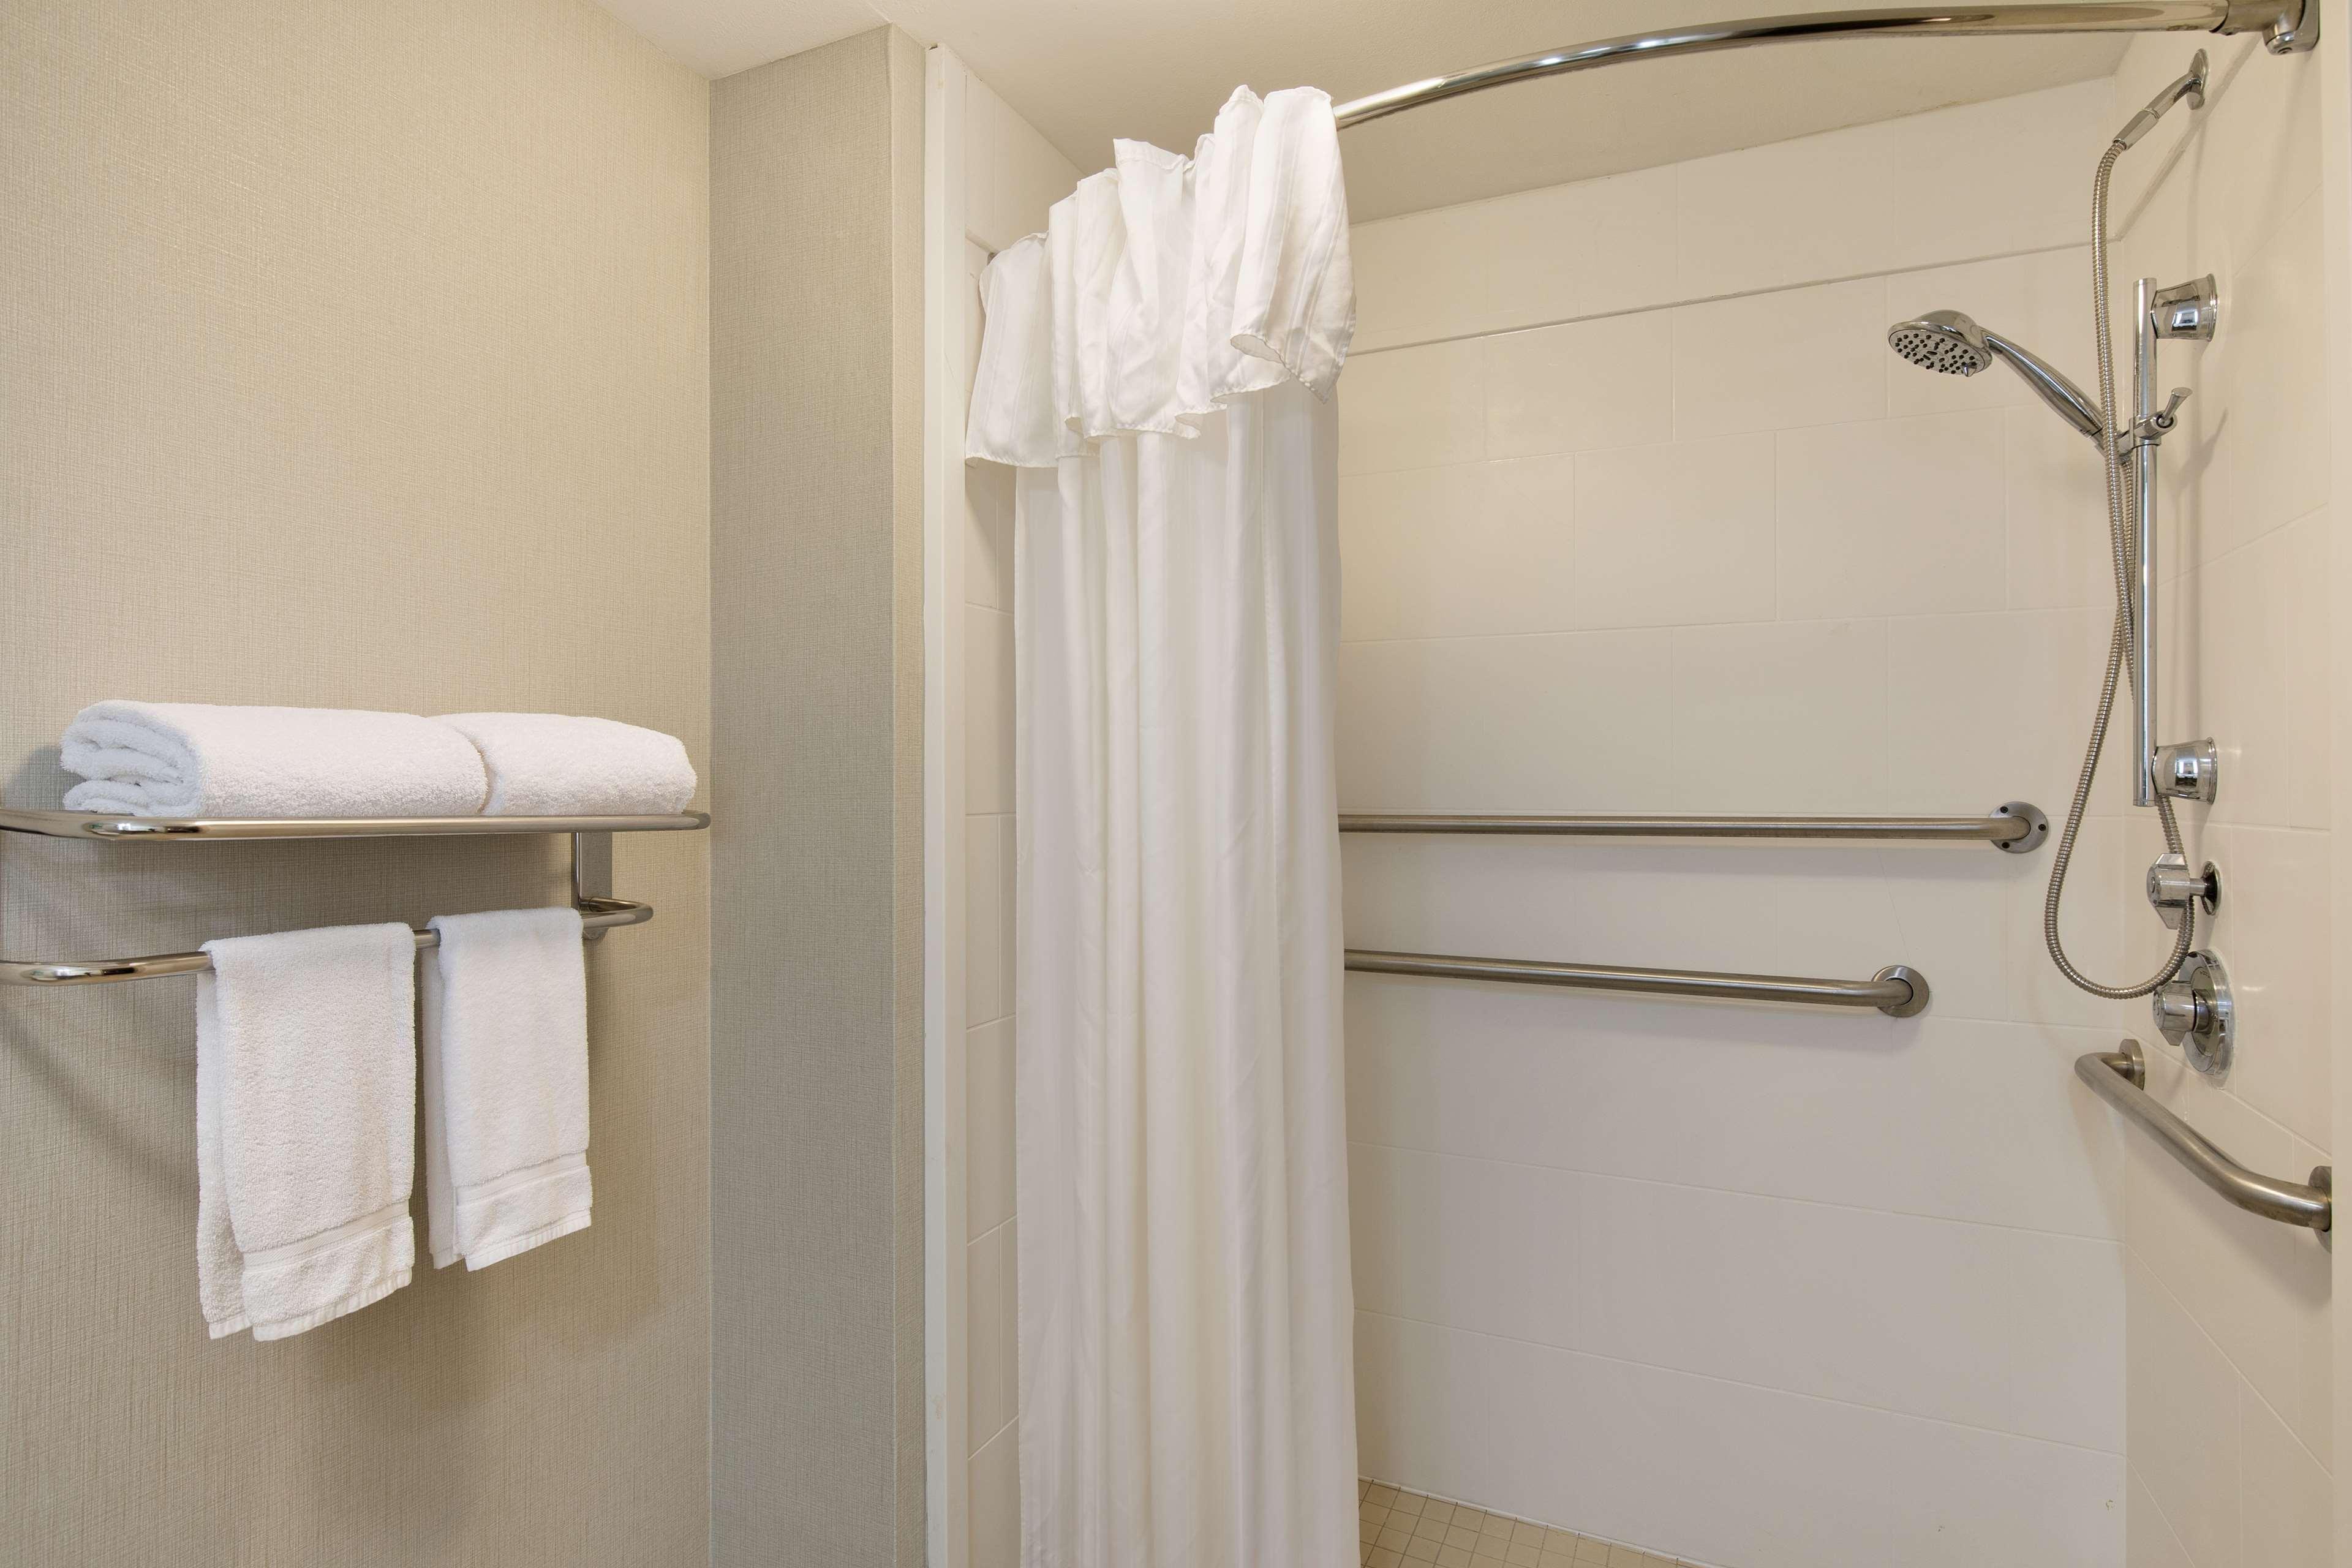 Homewood Suites by Hilton Lubbock image 16